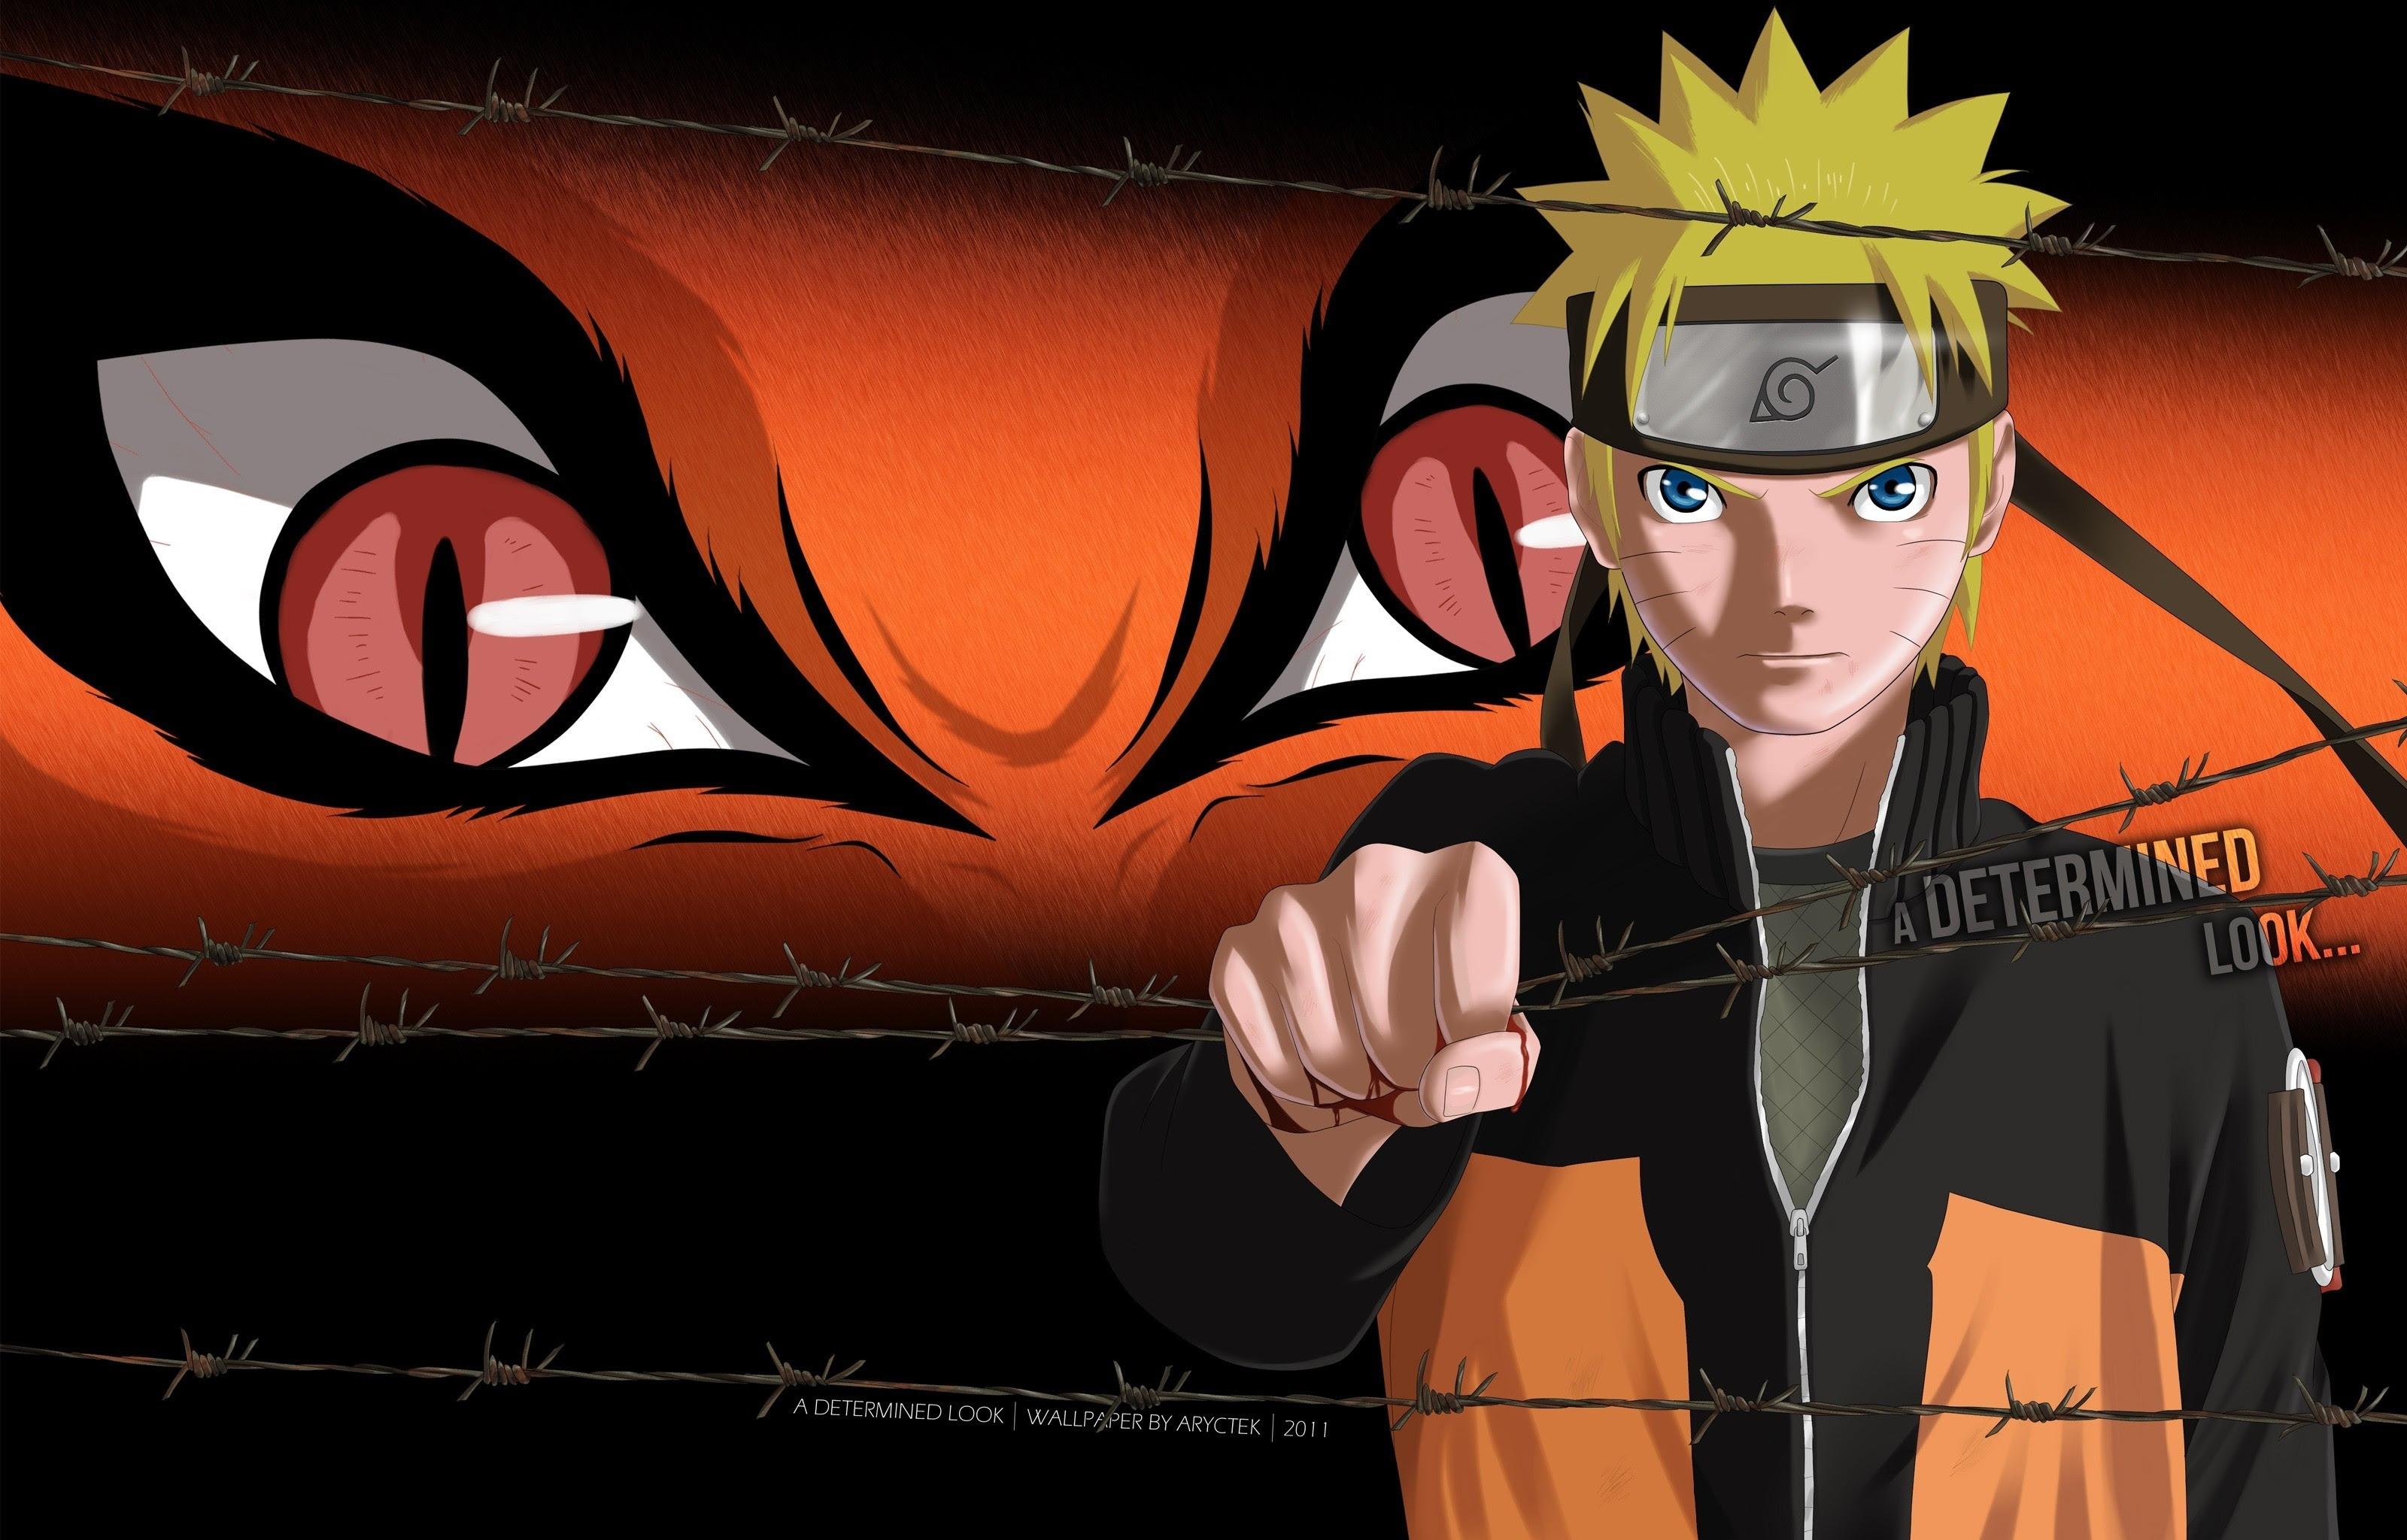 76+ Gambar Naruto Shippuden Wallpaper Paling Bagus